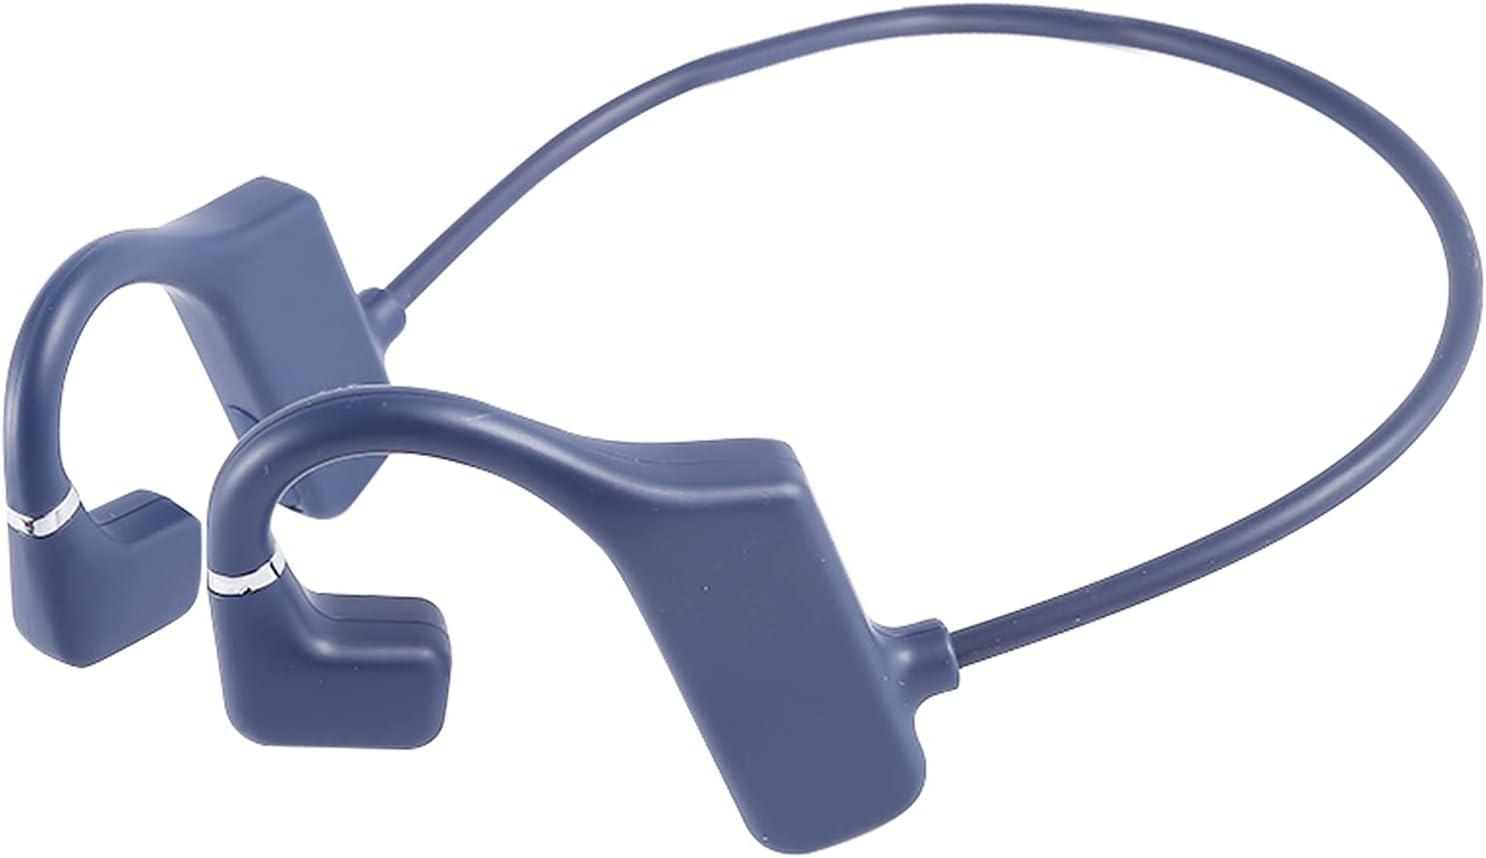 OCUhome Bone Conduction Headphones, Open Ear Headphones, G1 Bluetooth 5.1 Earphones IPX6 Waterproof 3D Surround Sound ABS Practical Wireless Bone Conduction Headsets for Sports Grey